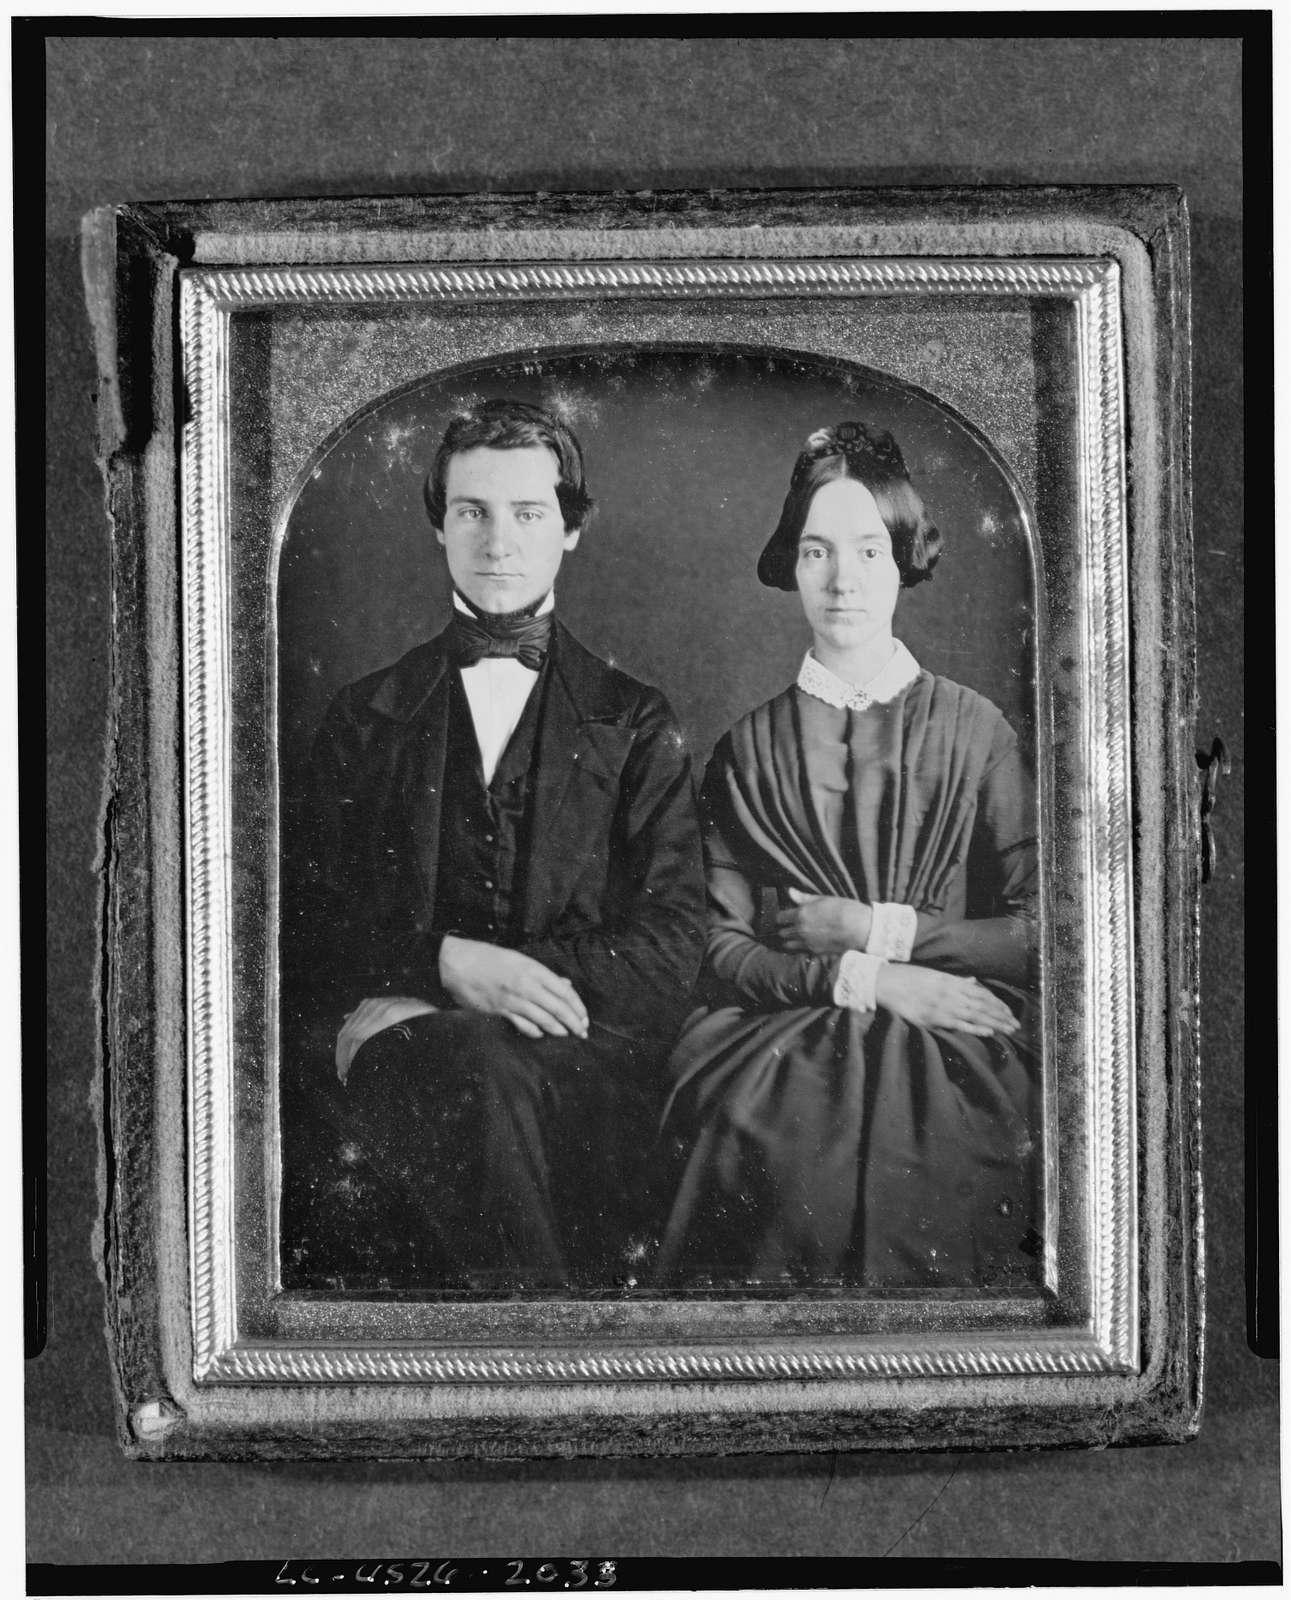 [Erasmus Darwin and Emily Cooper, three-quarter length portrait, seated]